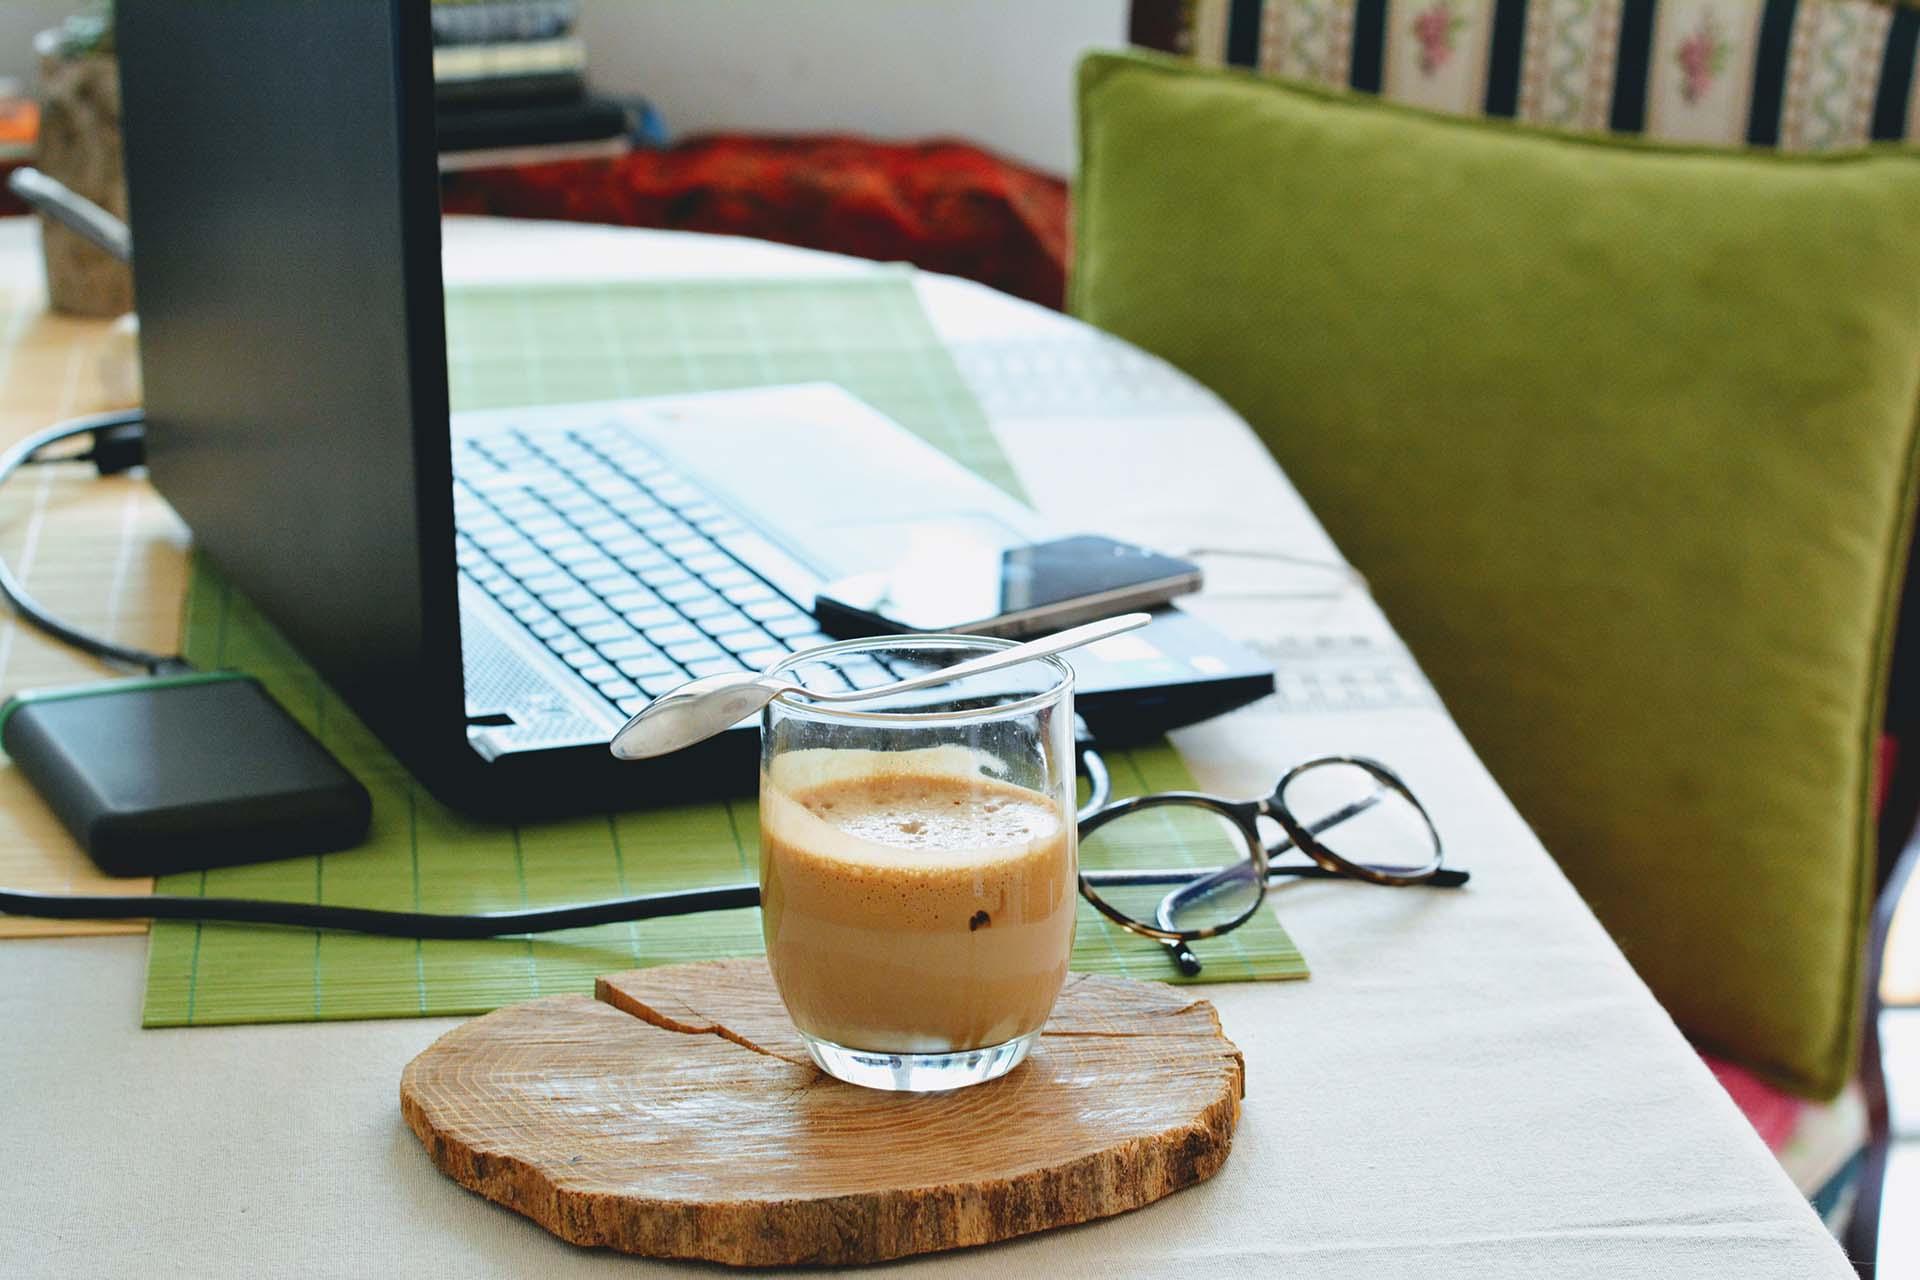 t2informatik Blog: Home office and leadership